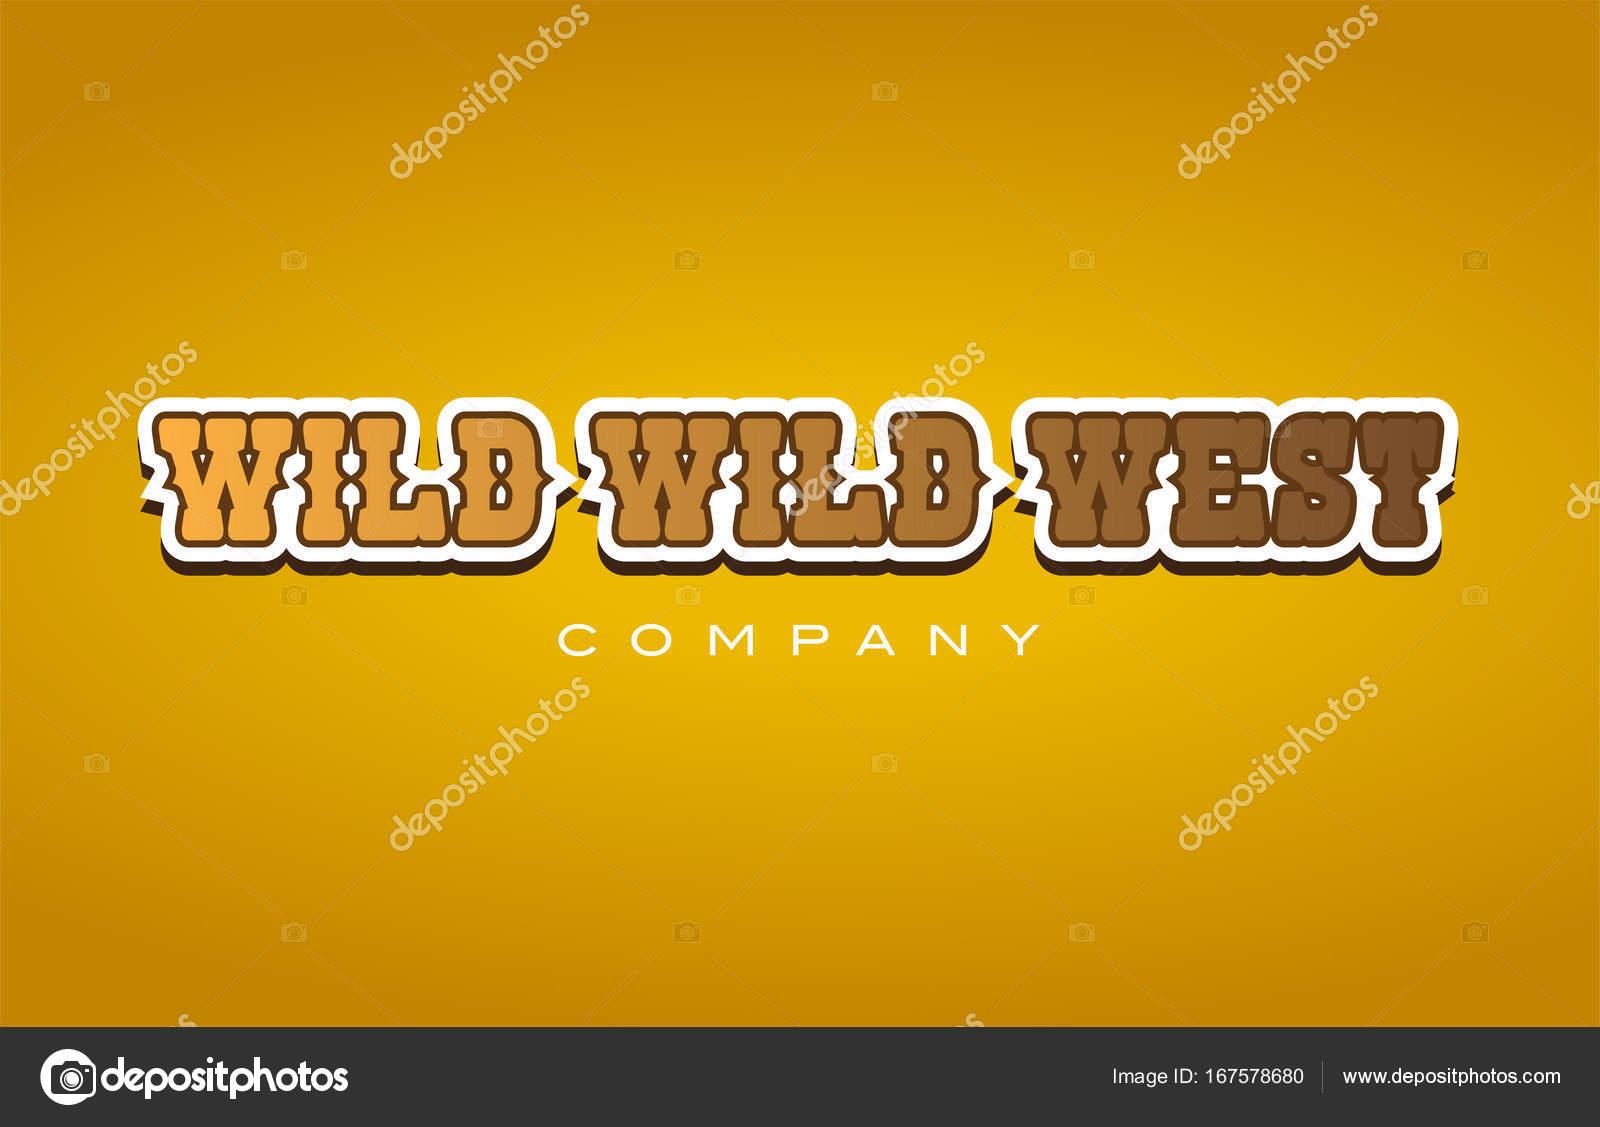 wild wild west western style word text logo design icon company